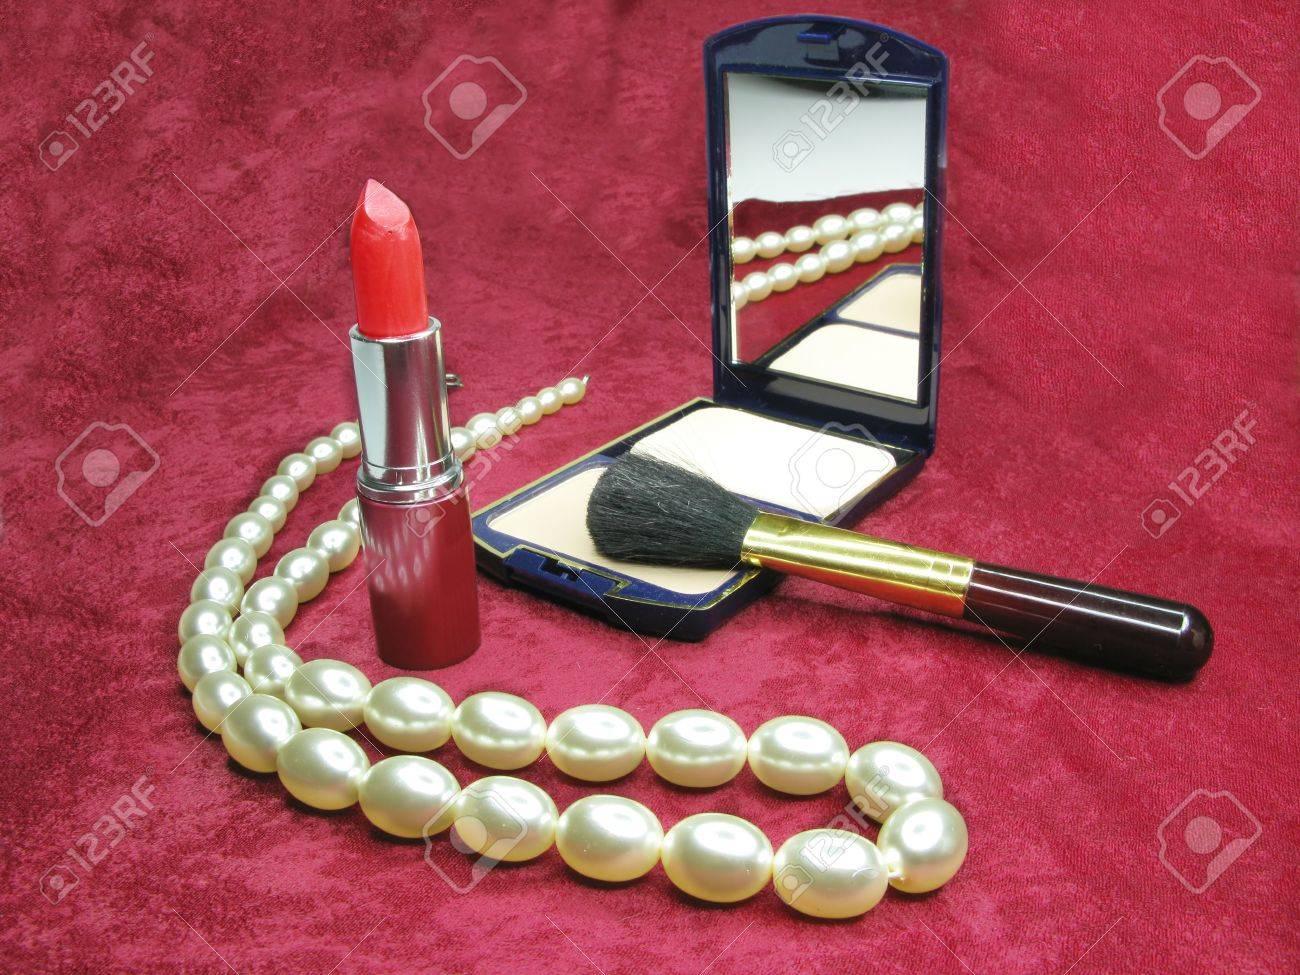 red lipstick powder white beads on purple cloth background Stock Photo - 11921232